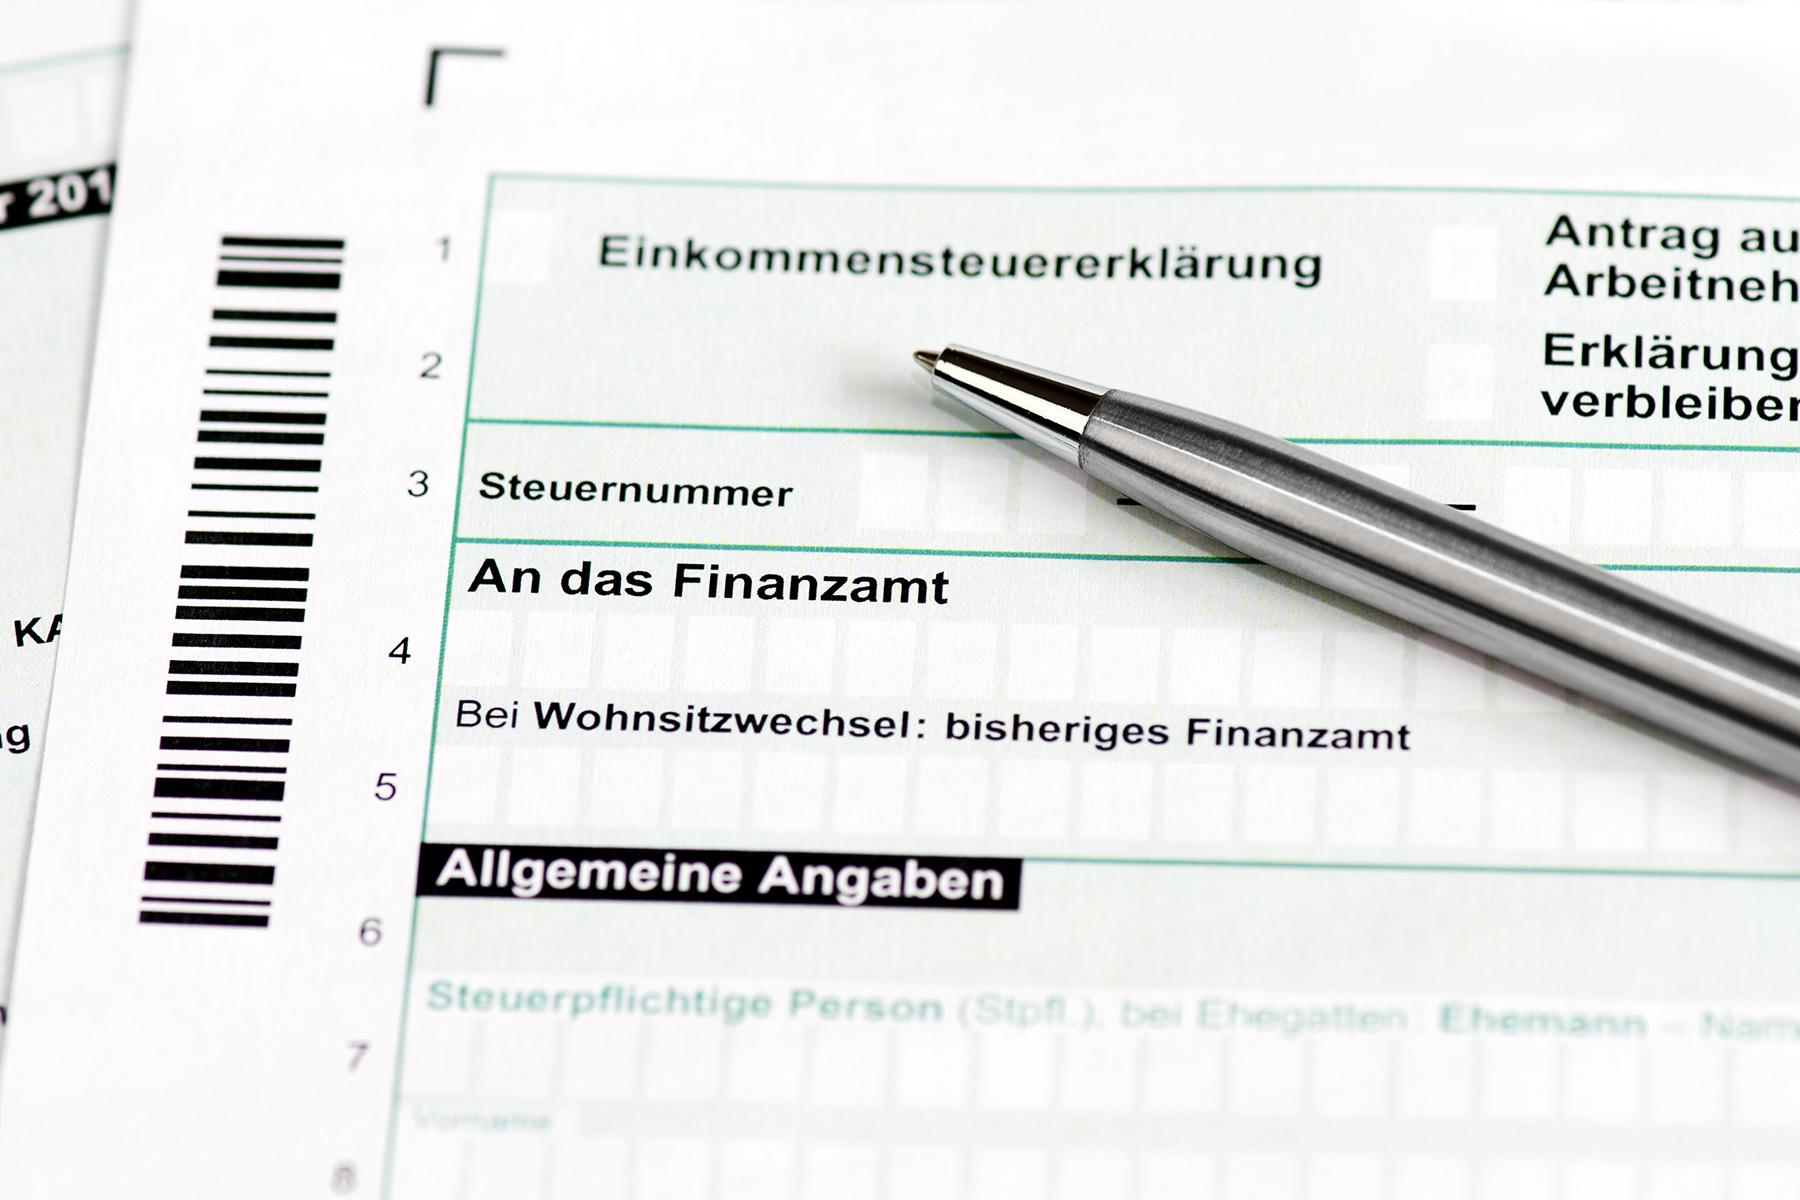 German income tax form